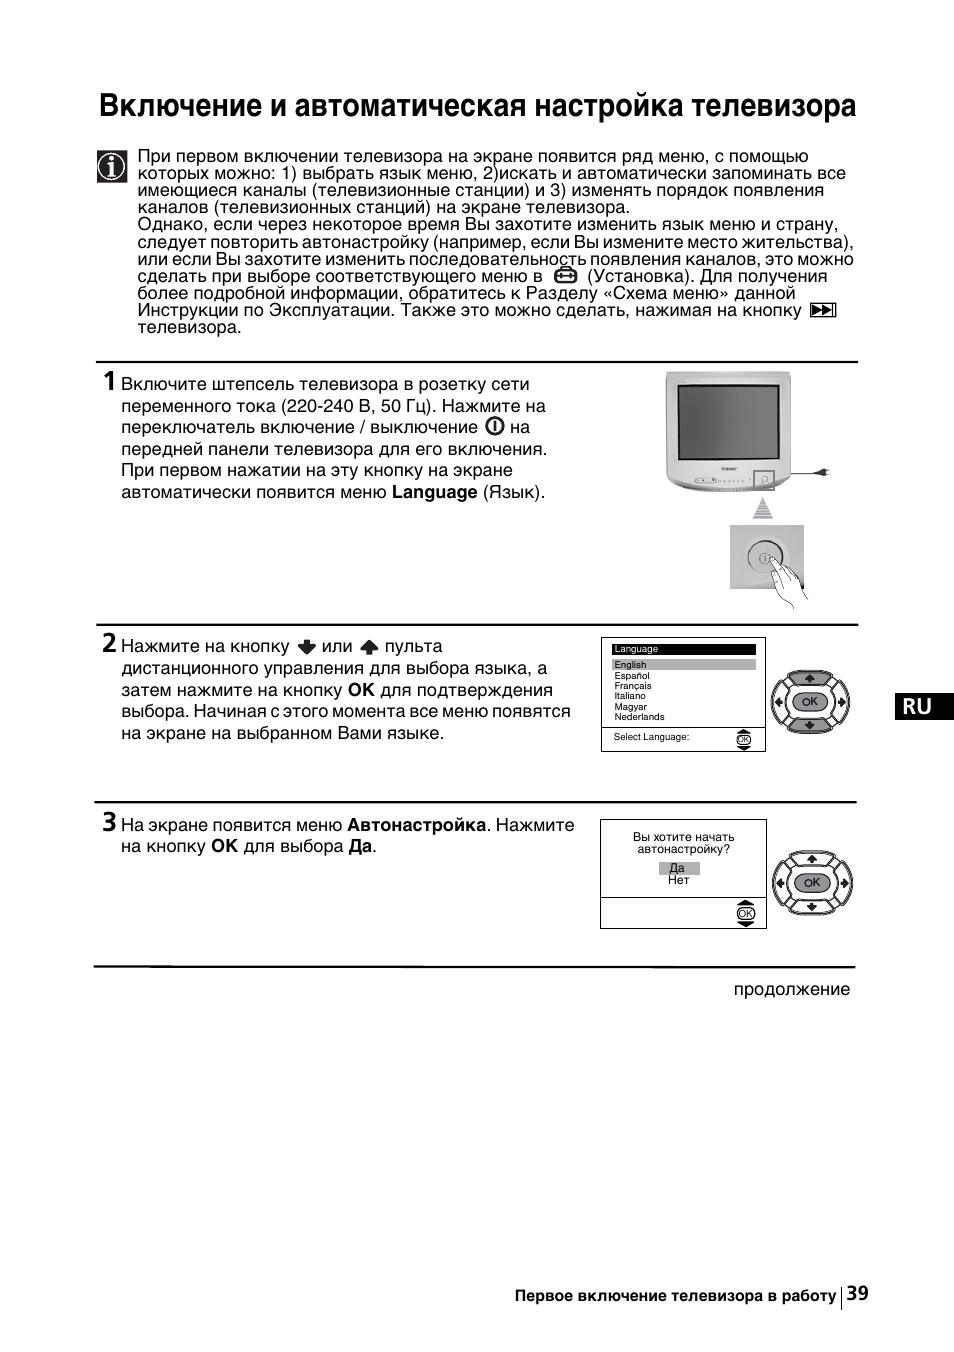 инструкция телевизора sony kv-x2961k